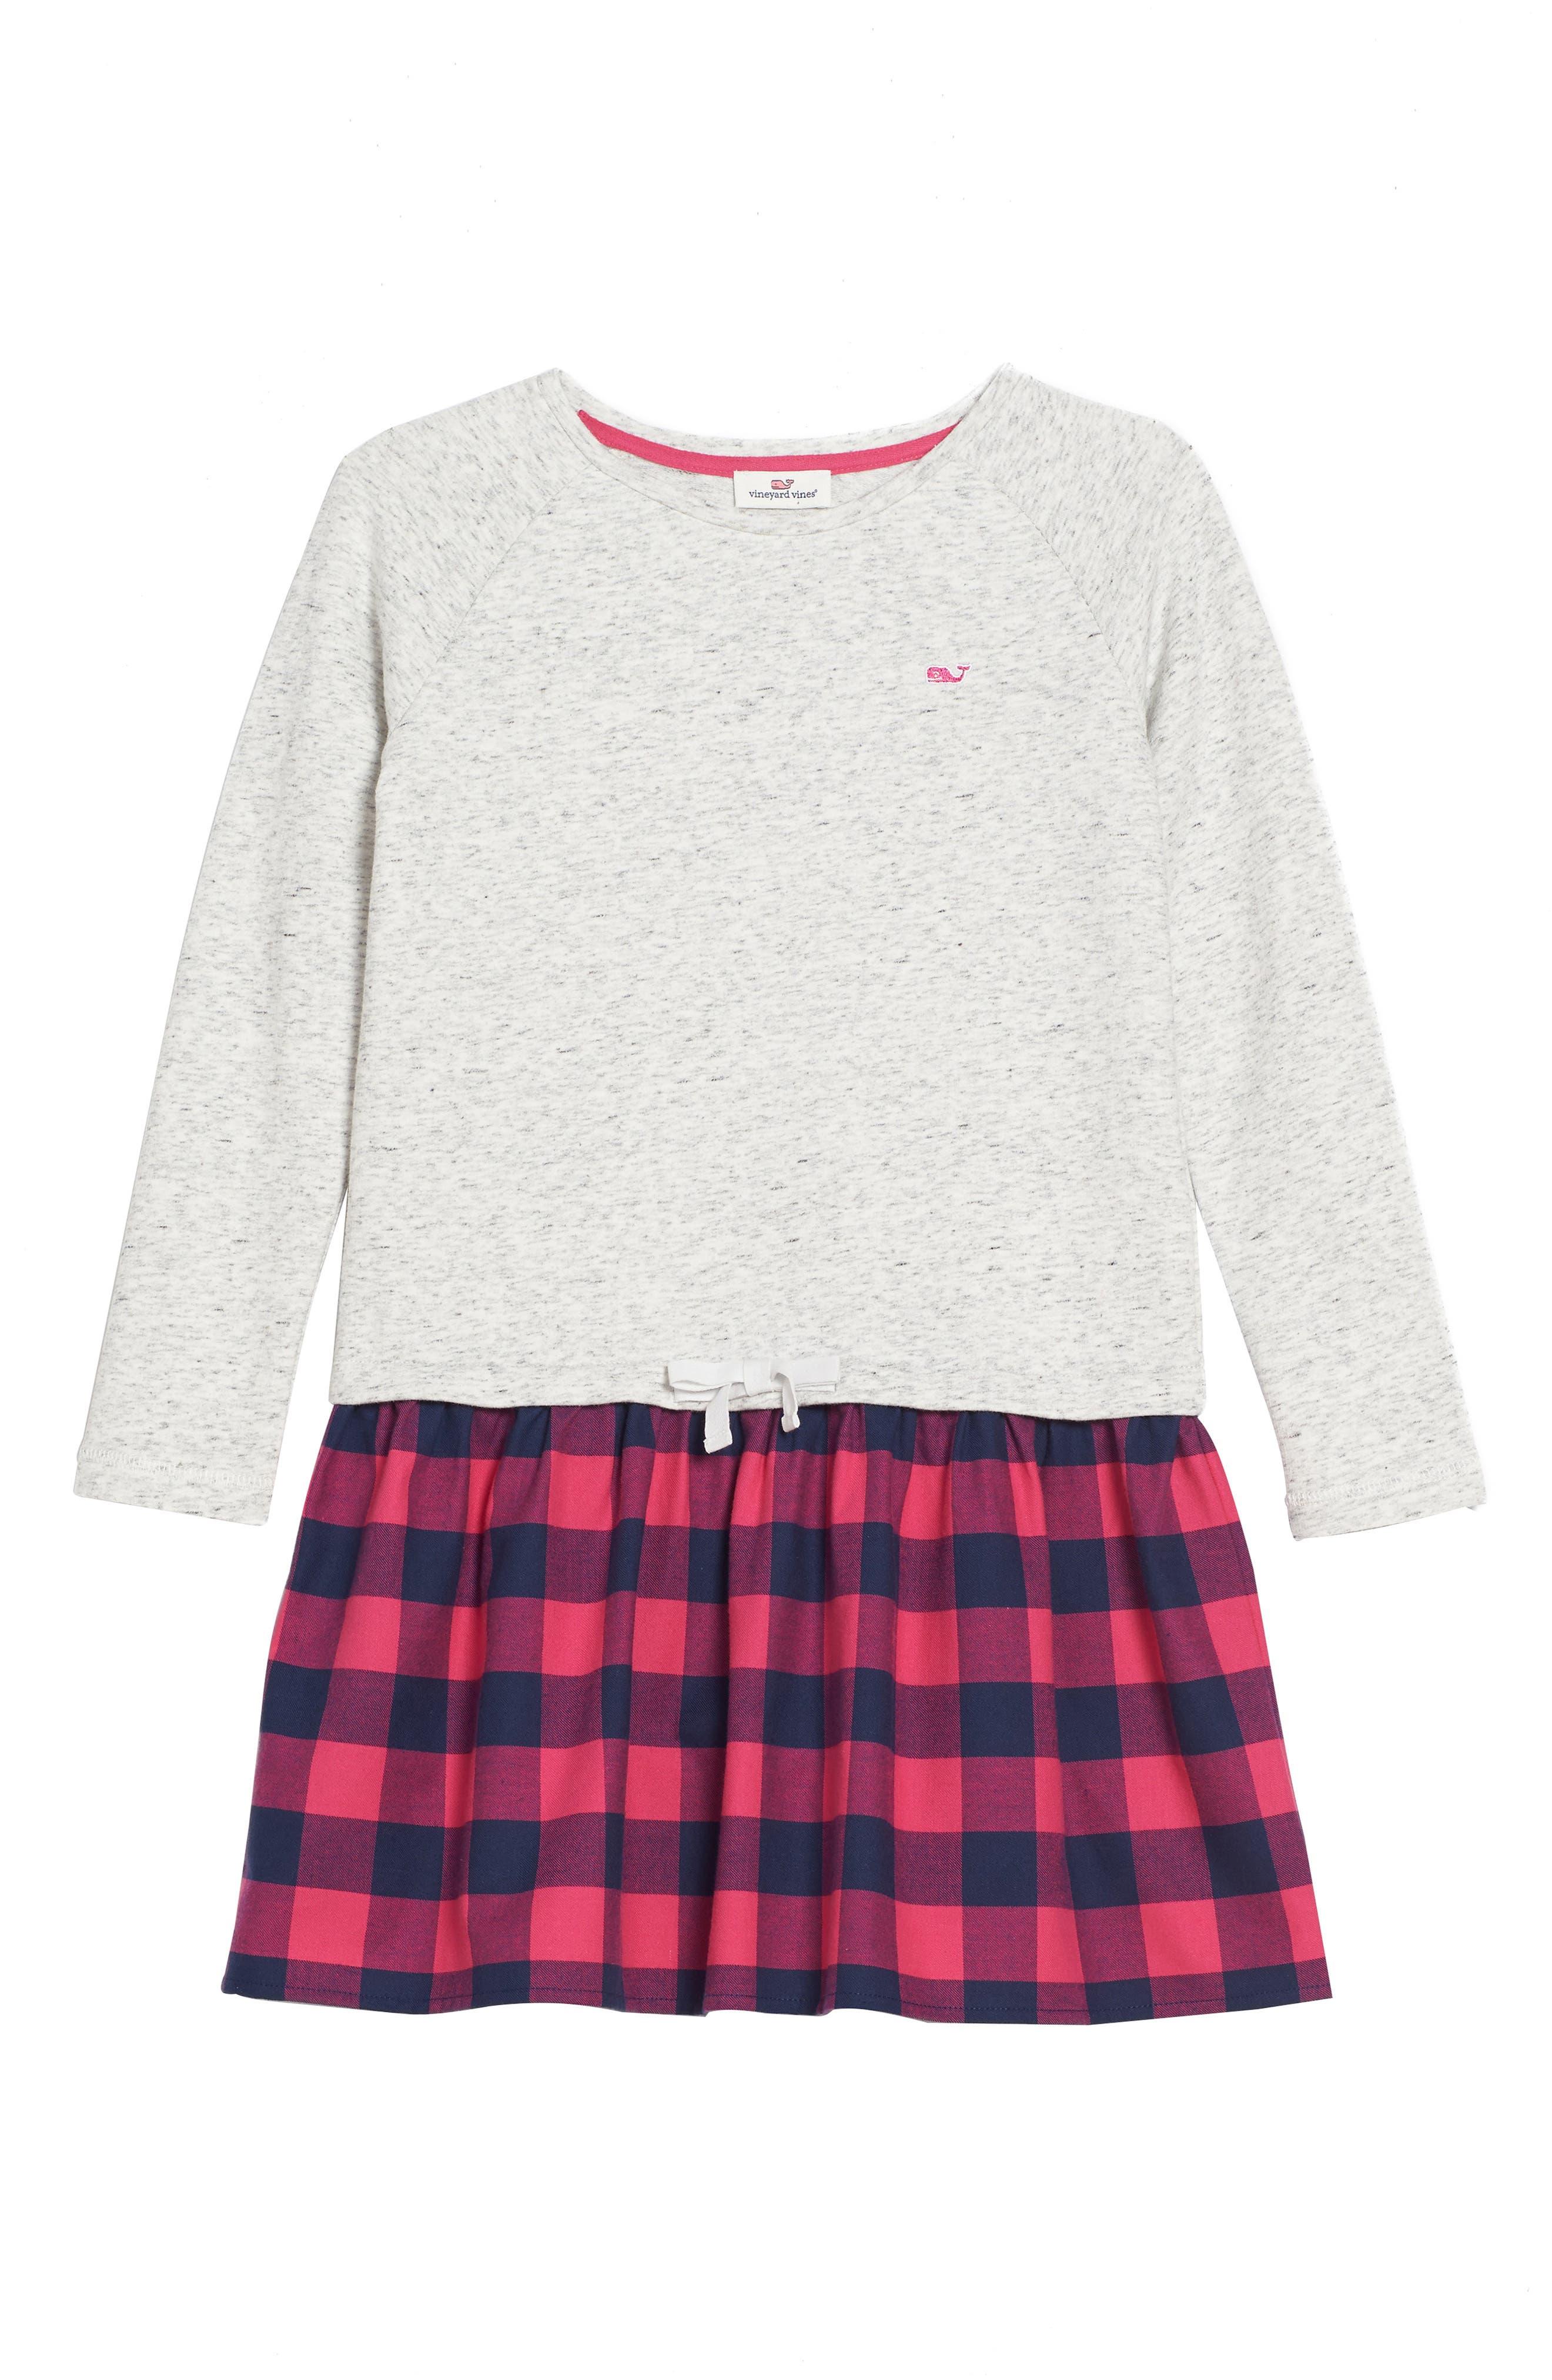 Main Image - vineyard vines Buffalo Check Sweatshirt (Toddler Girls)